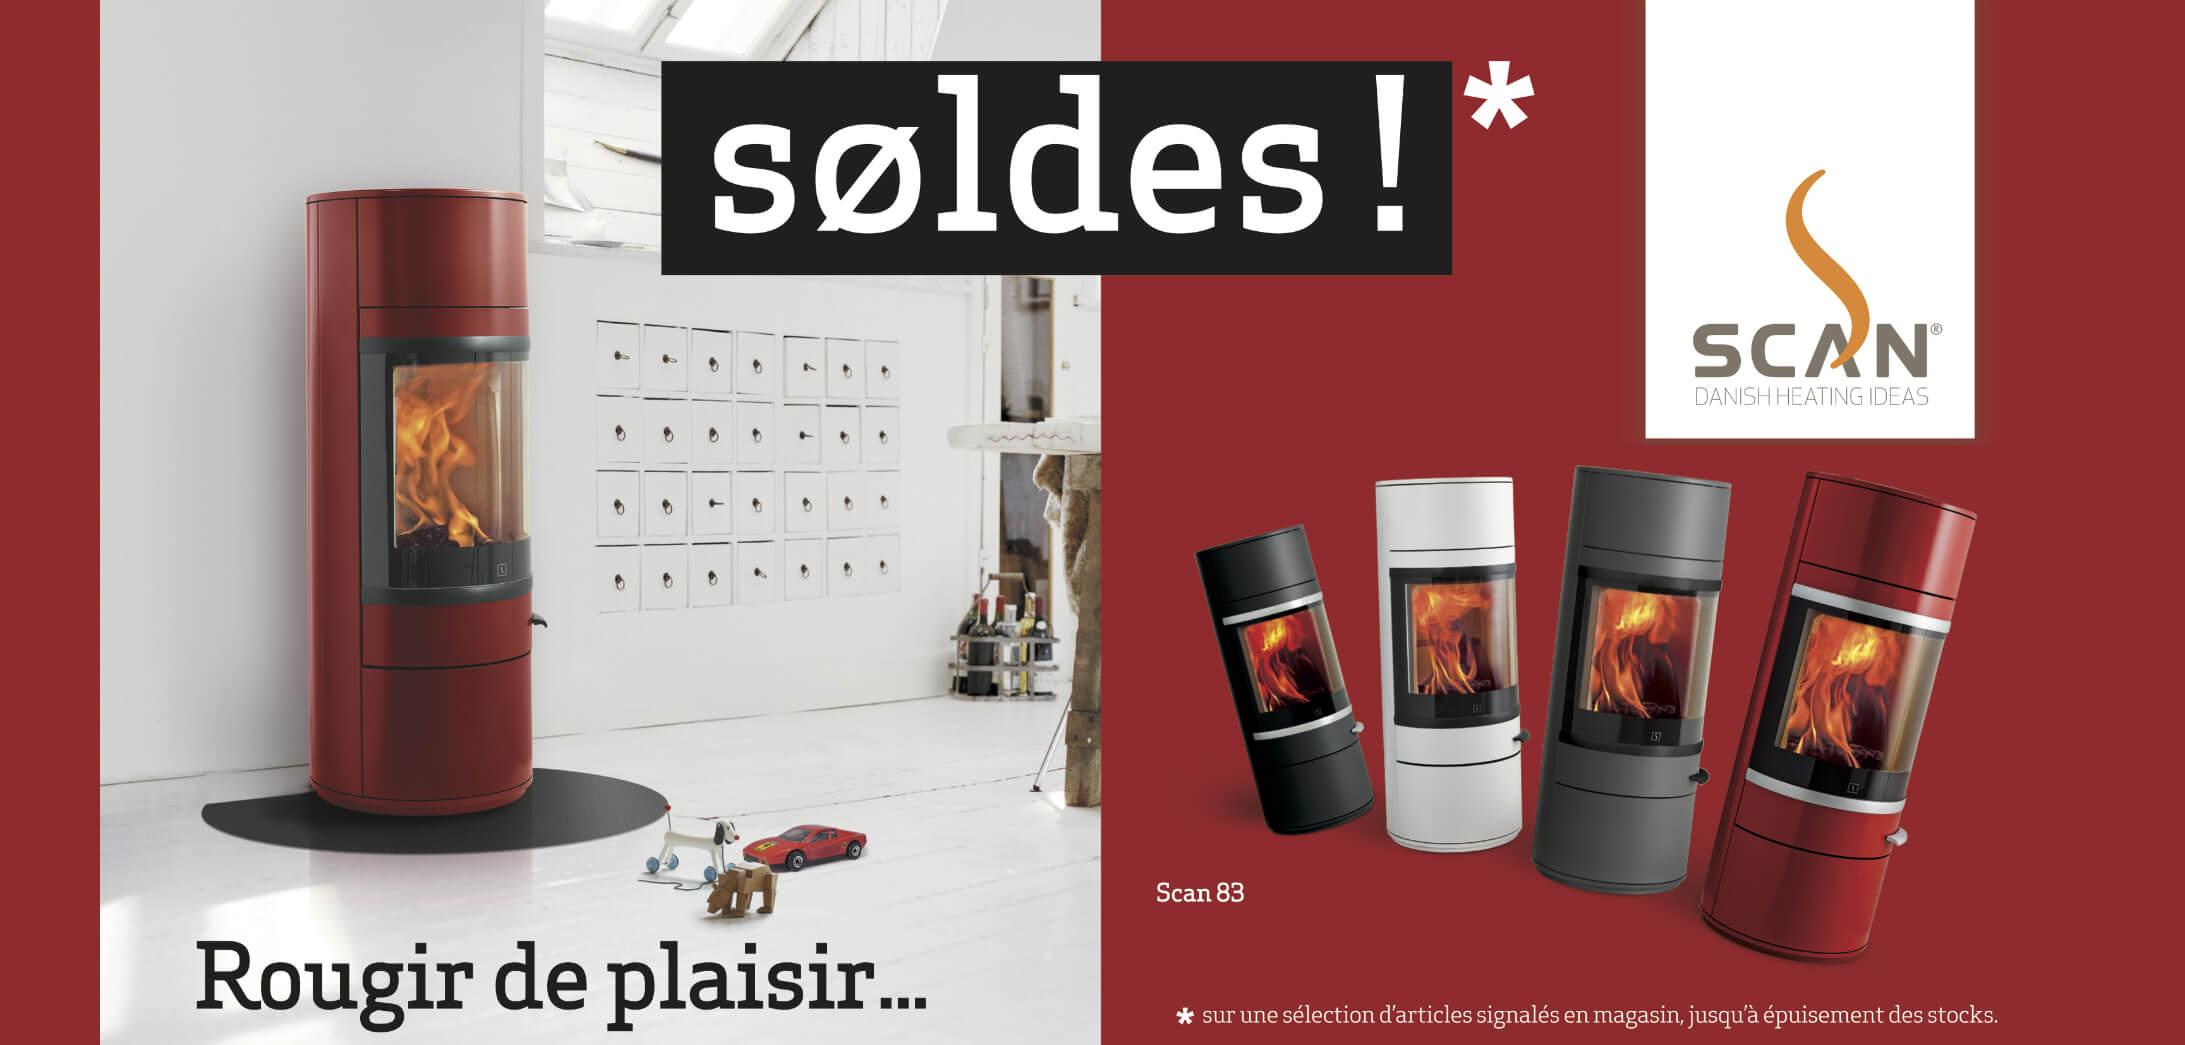 SCAN_SOLDES_ETE2017_AP_2183X1045_HD